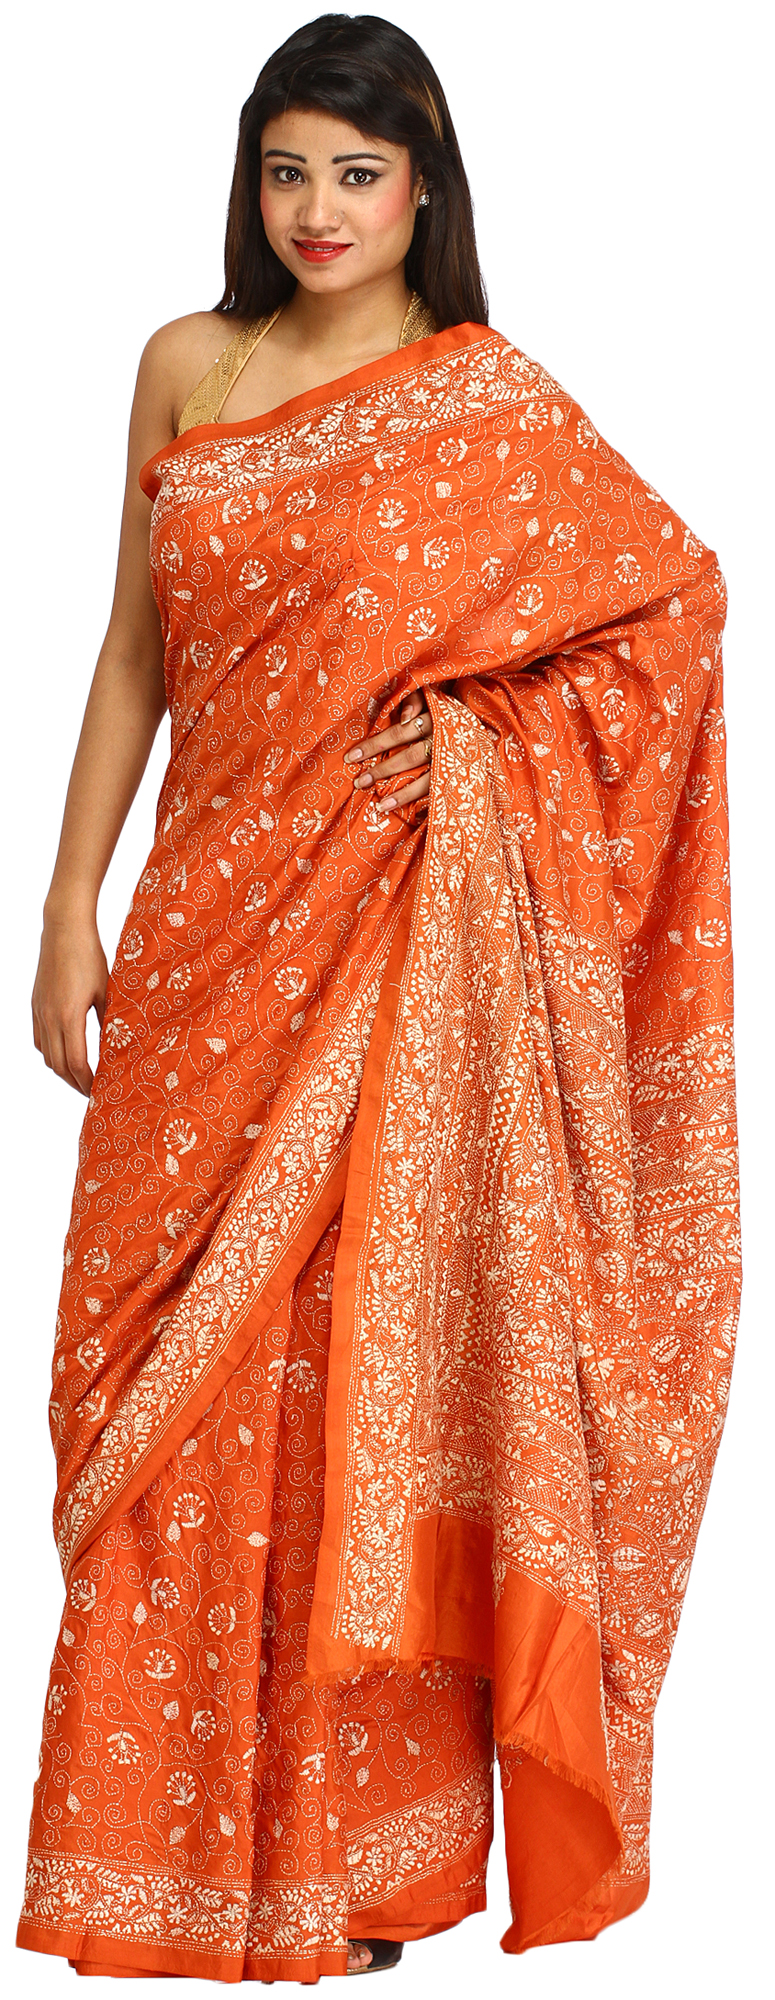 Rust orange sari from kolkata with kantha hand embroidery